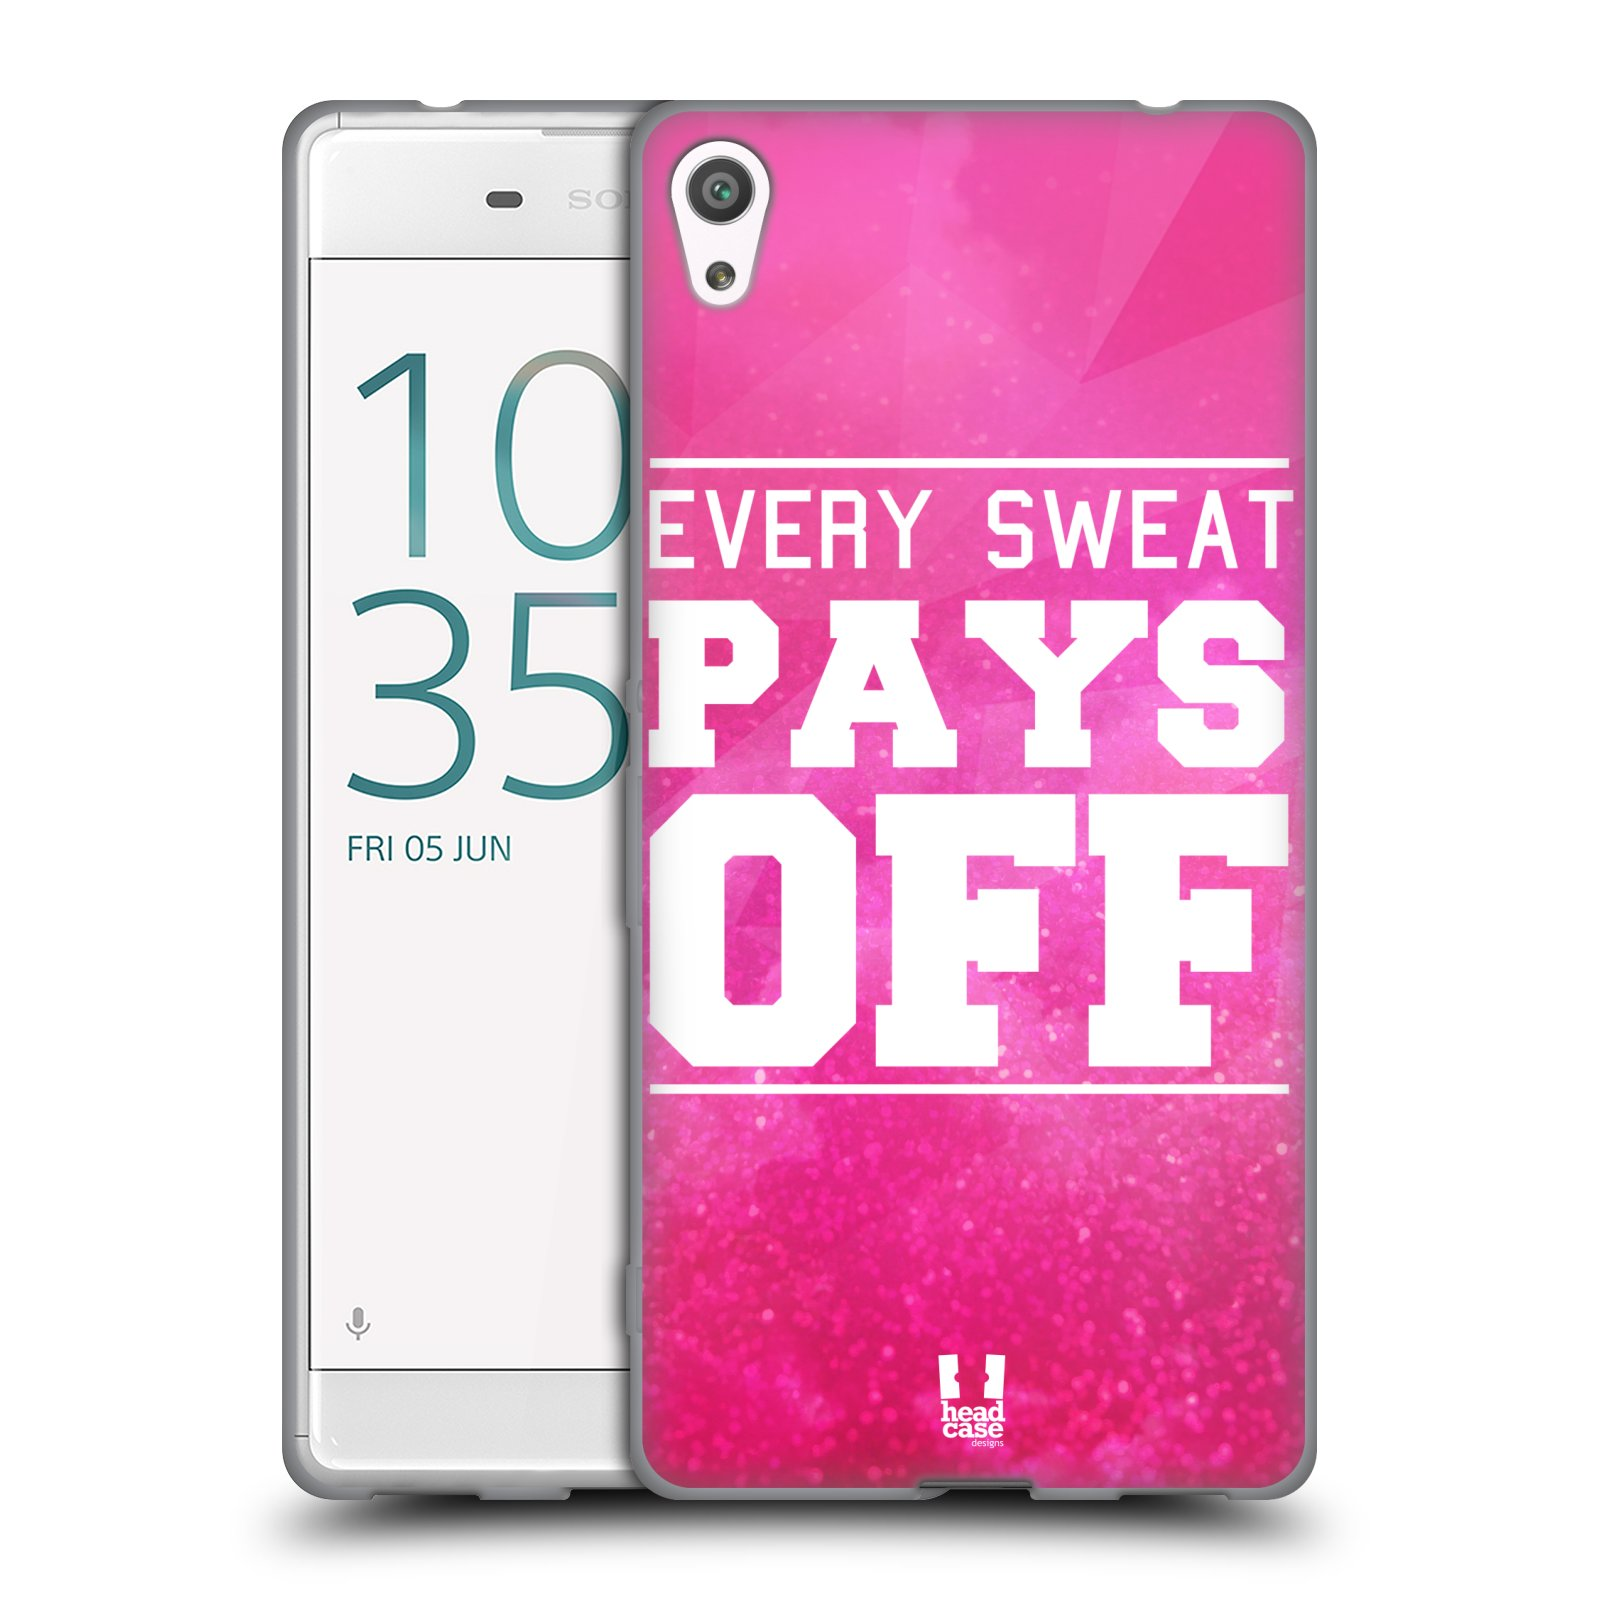 HEAD CASE silikonový obal na mobil Sony Xperia XA ULTRA Sportovní nápisy růžová barva POT a DŘINA